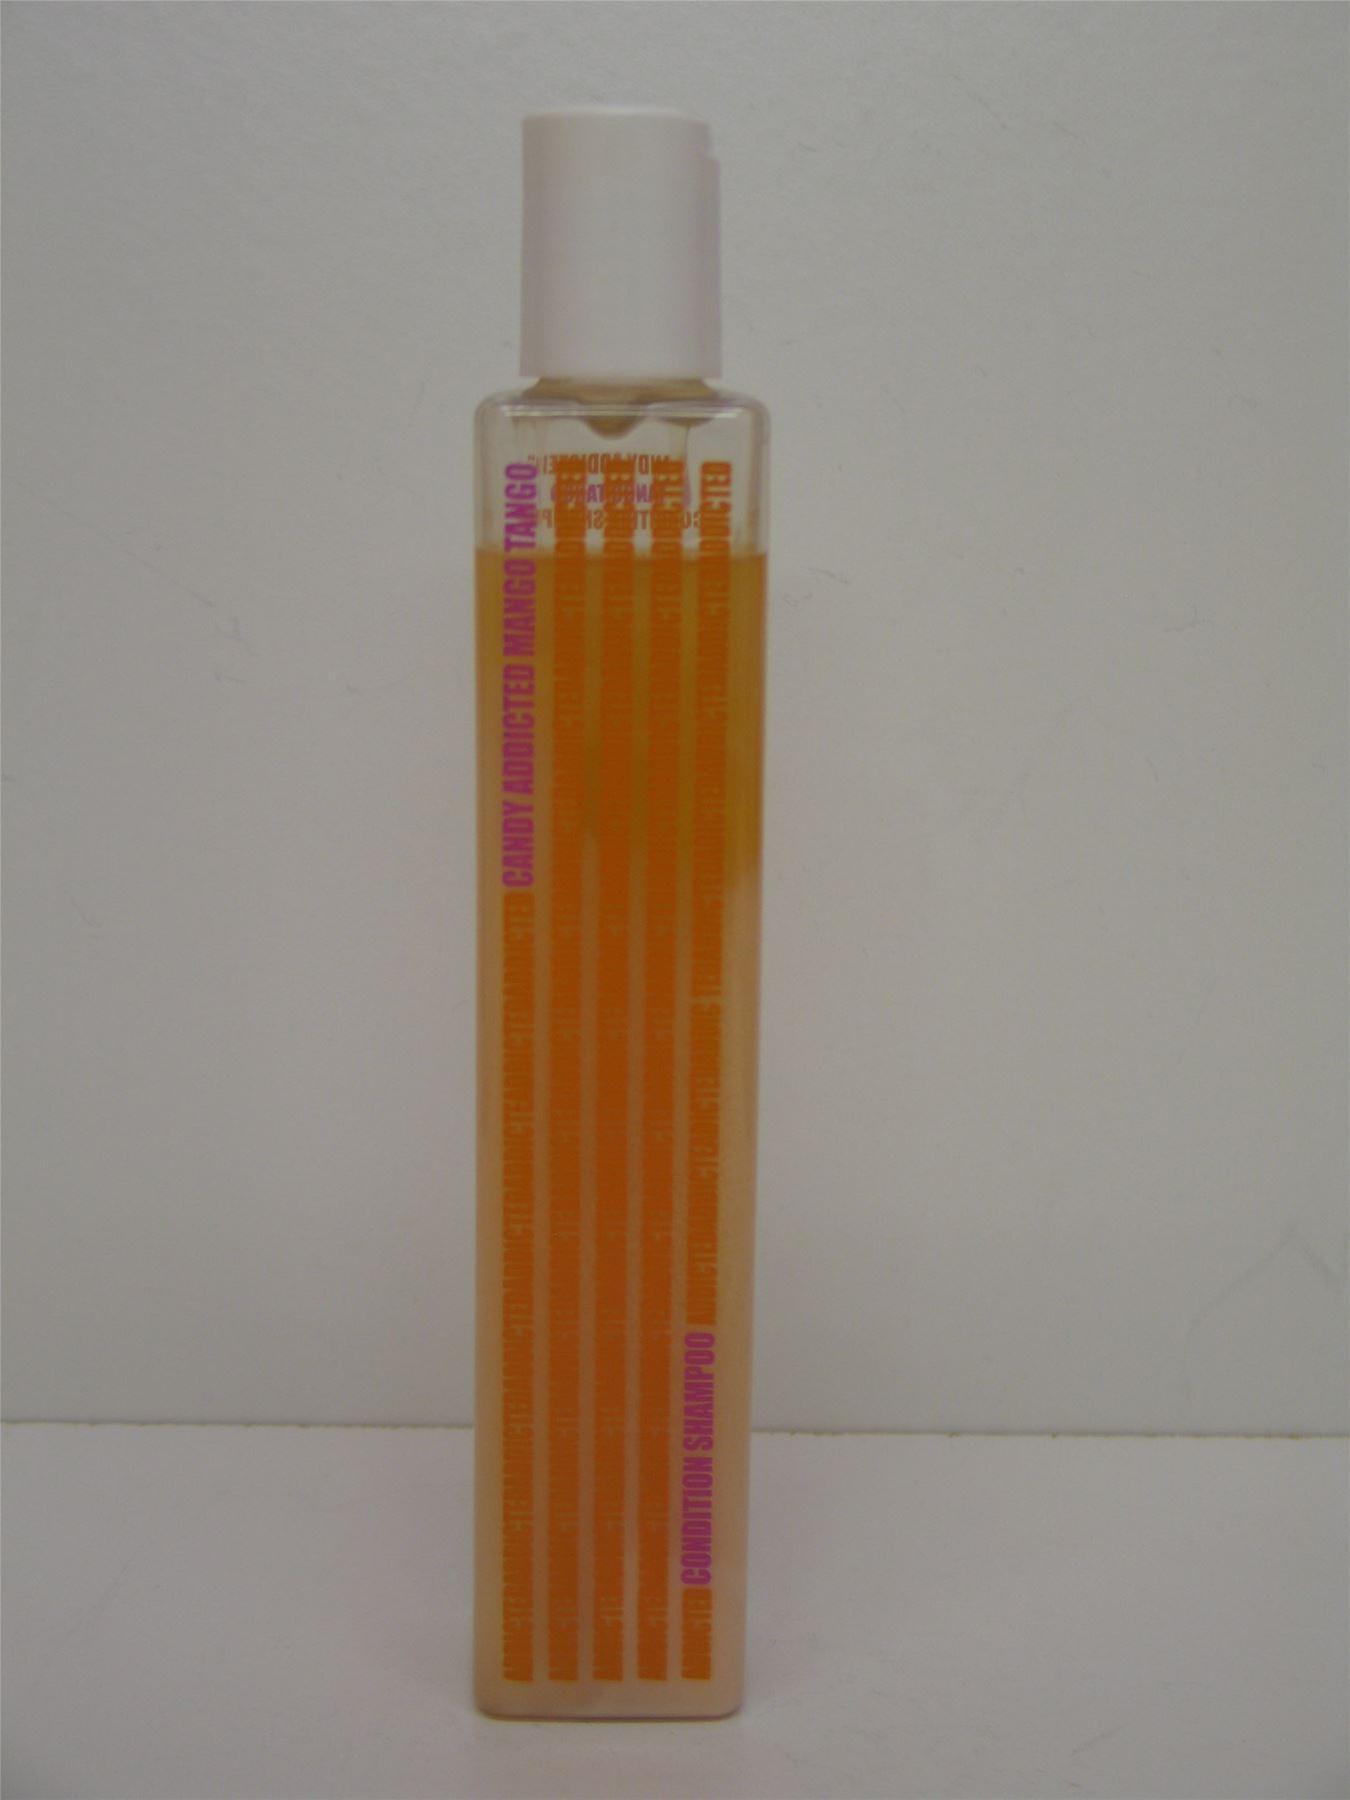 2 x Candy Addicted Mango Tango Condition Shampoo 2 x 250ml